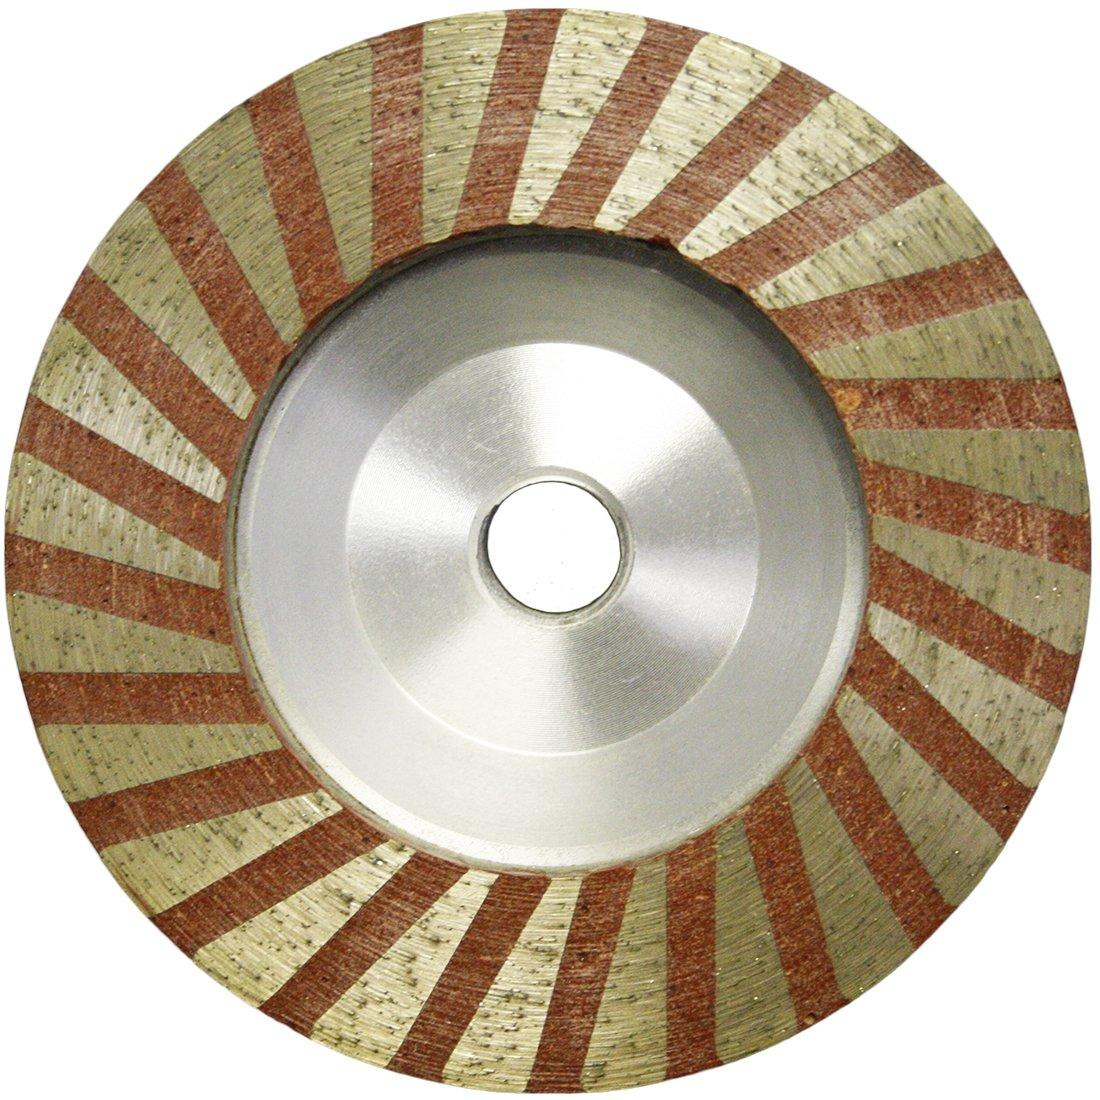 4'' Slayer Resin filled Turbo Cup Wheel Alum Backer - Medium by Slayer